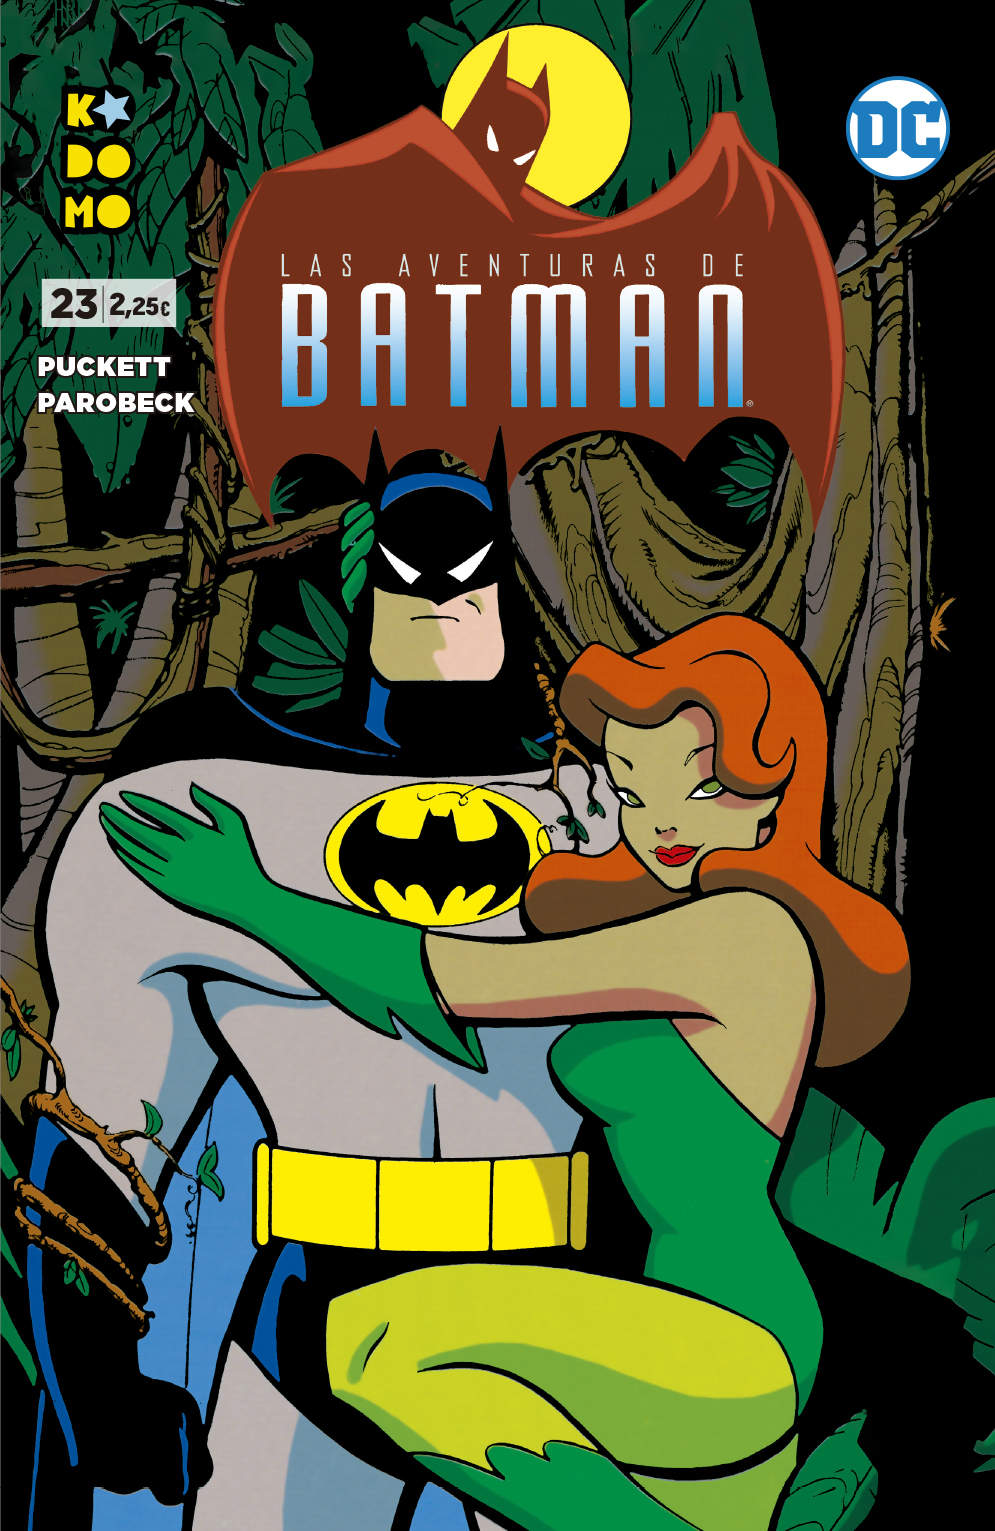 Las aventuras de Batman núm. 23